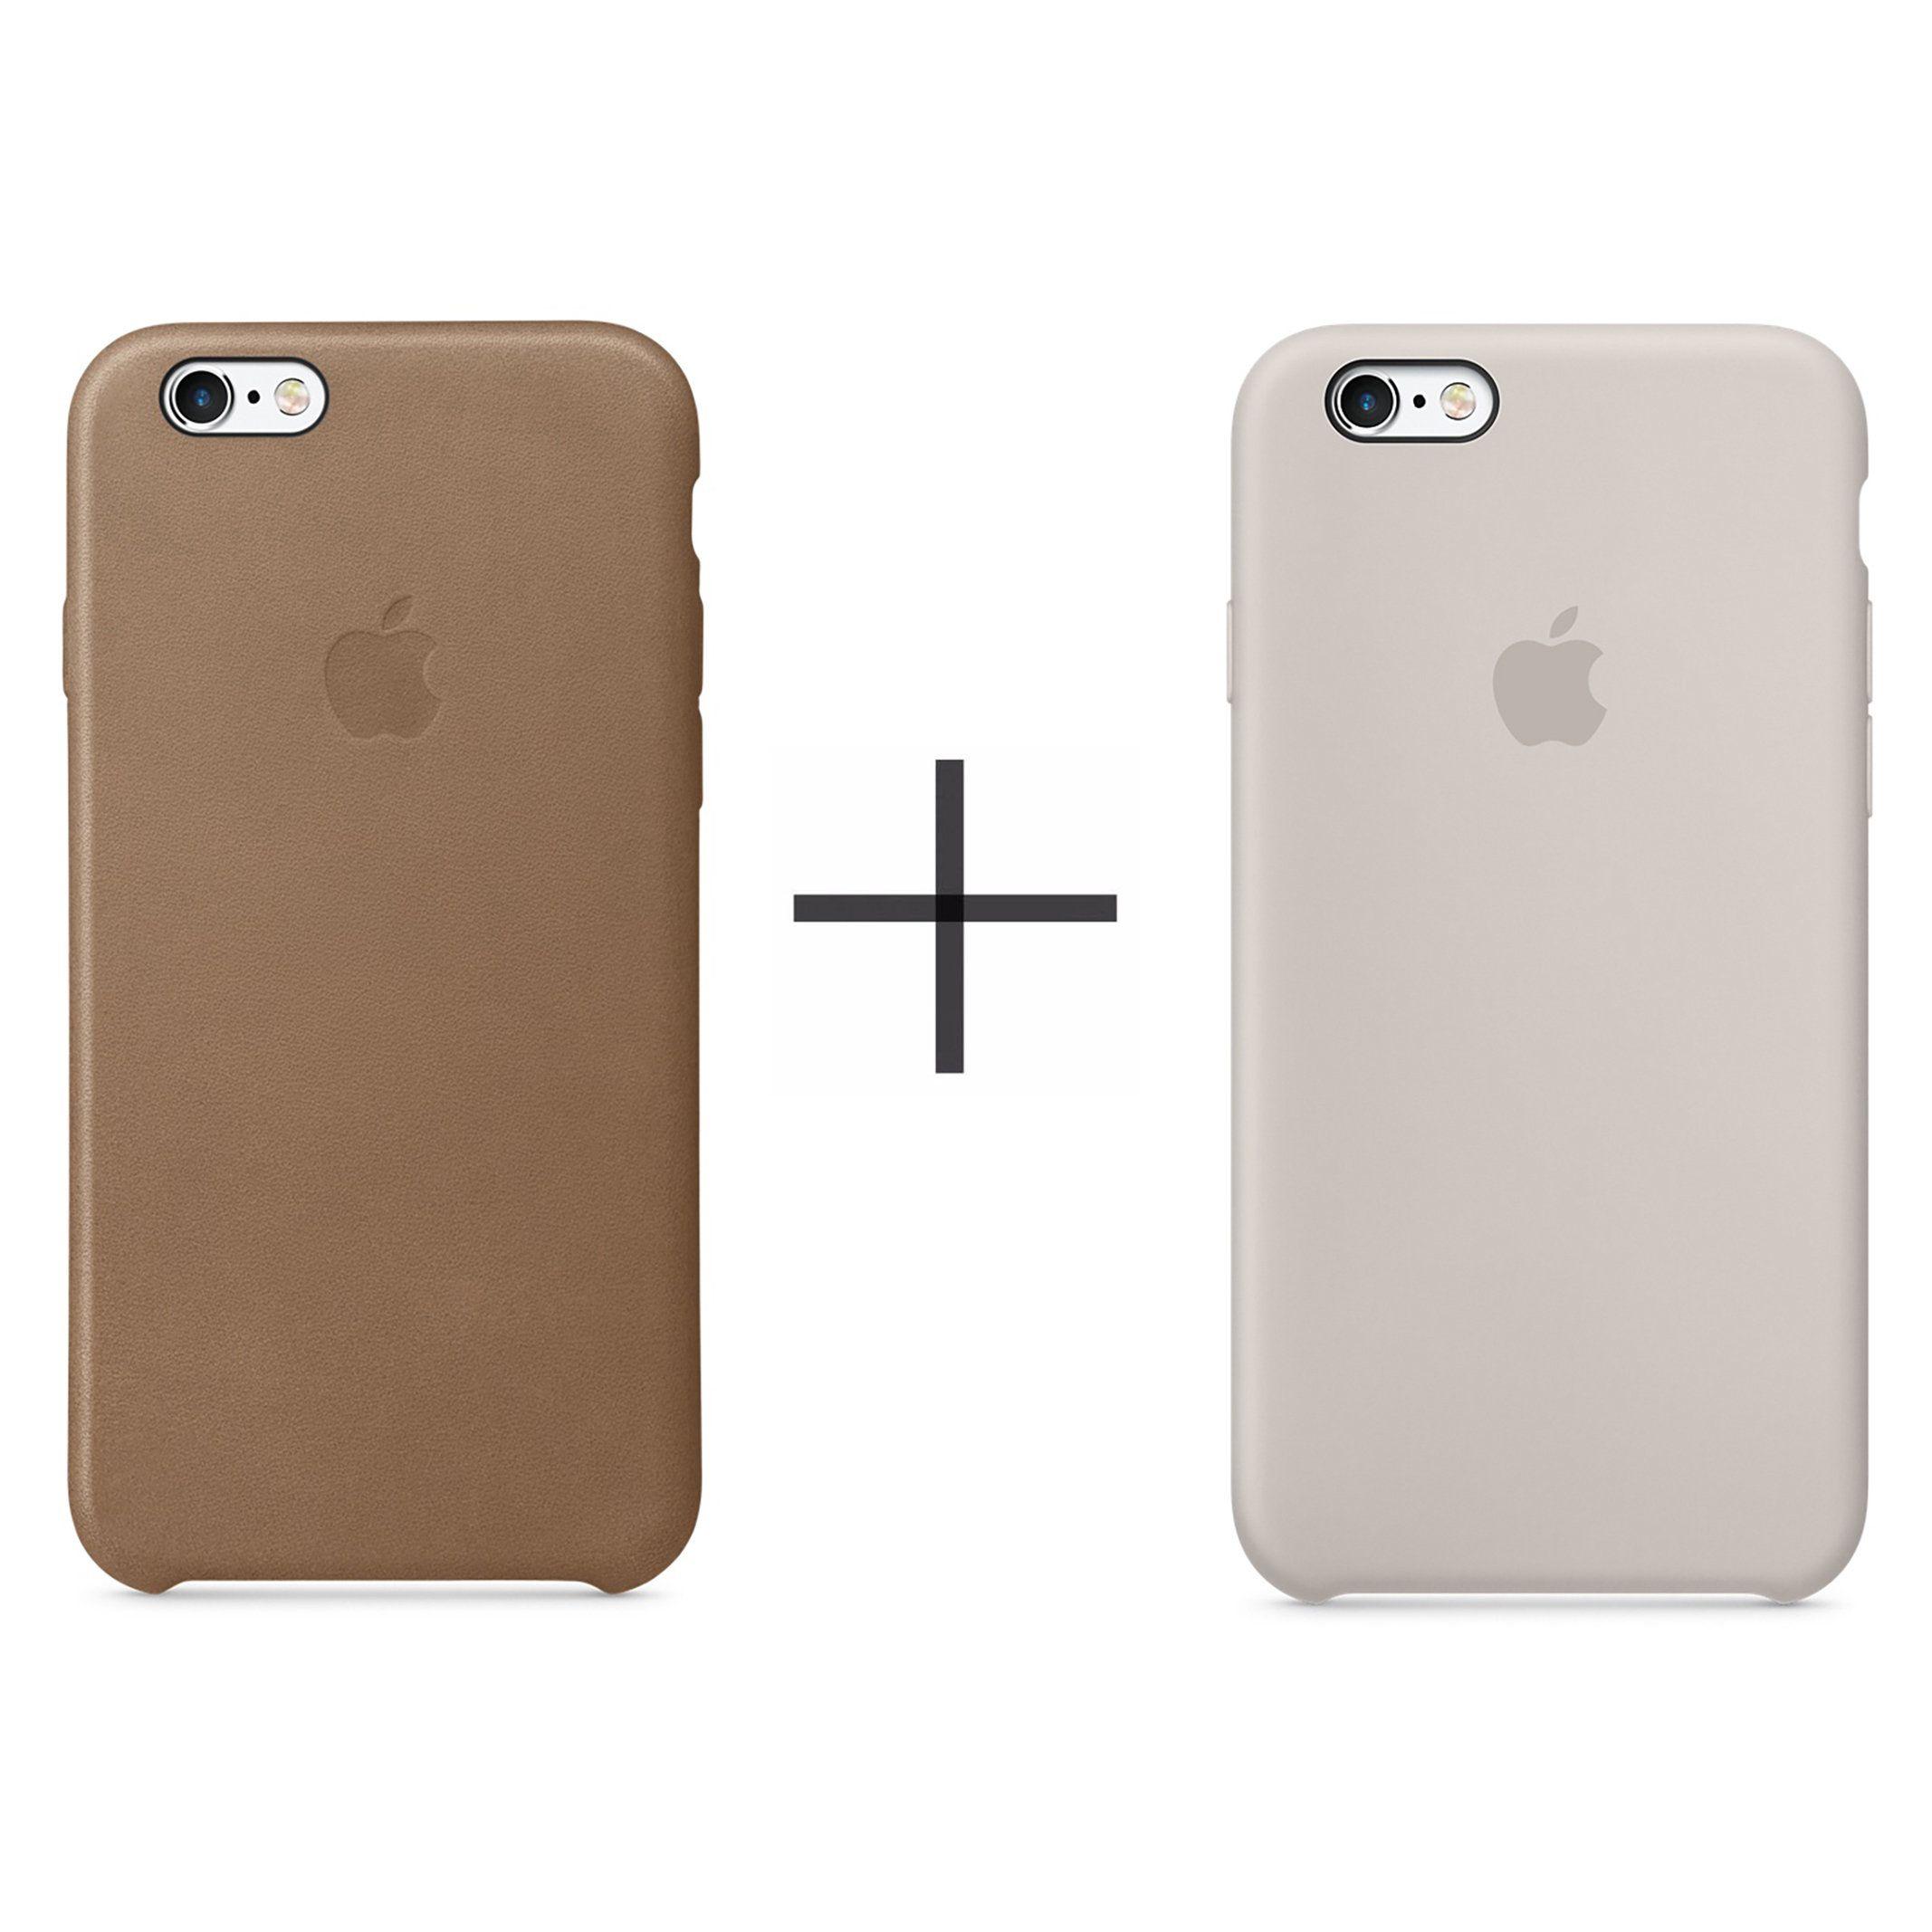 Apple Iphone 6 Plus 6s Plus Leather Case Brown Apple Iphone 6